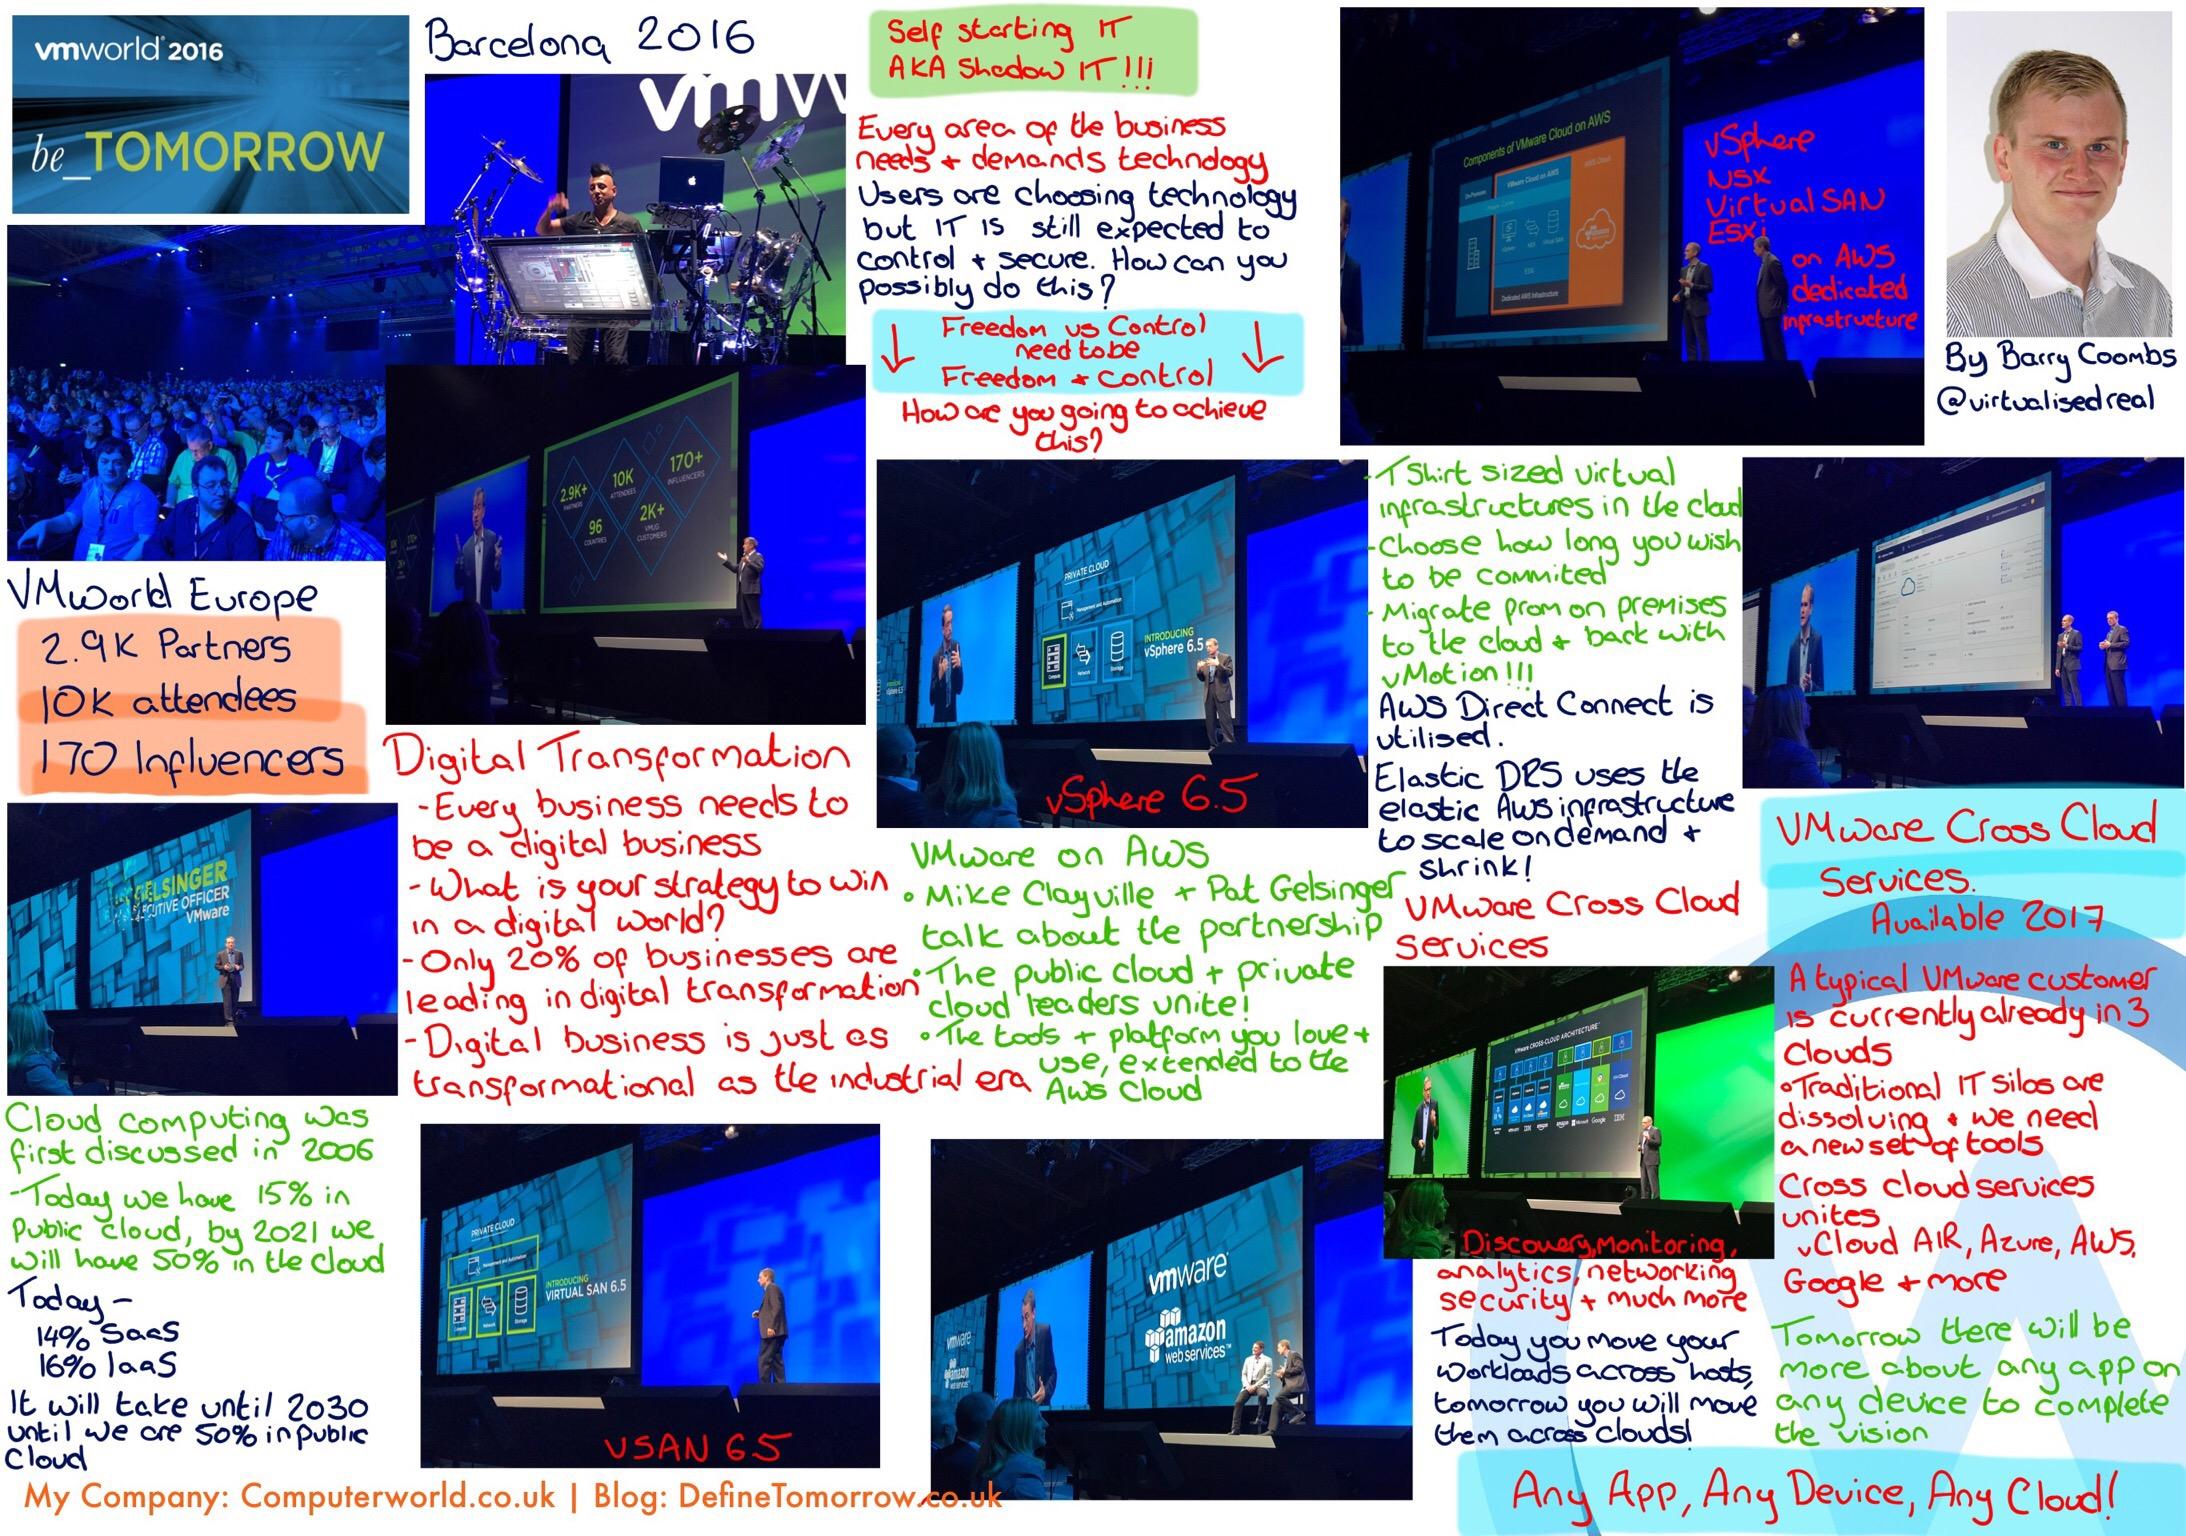 VMworld Barcelona 2016 General Session